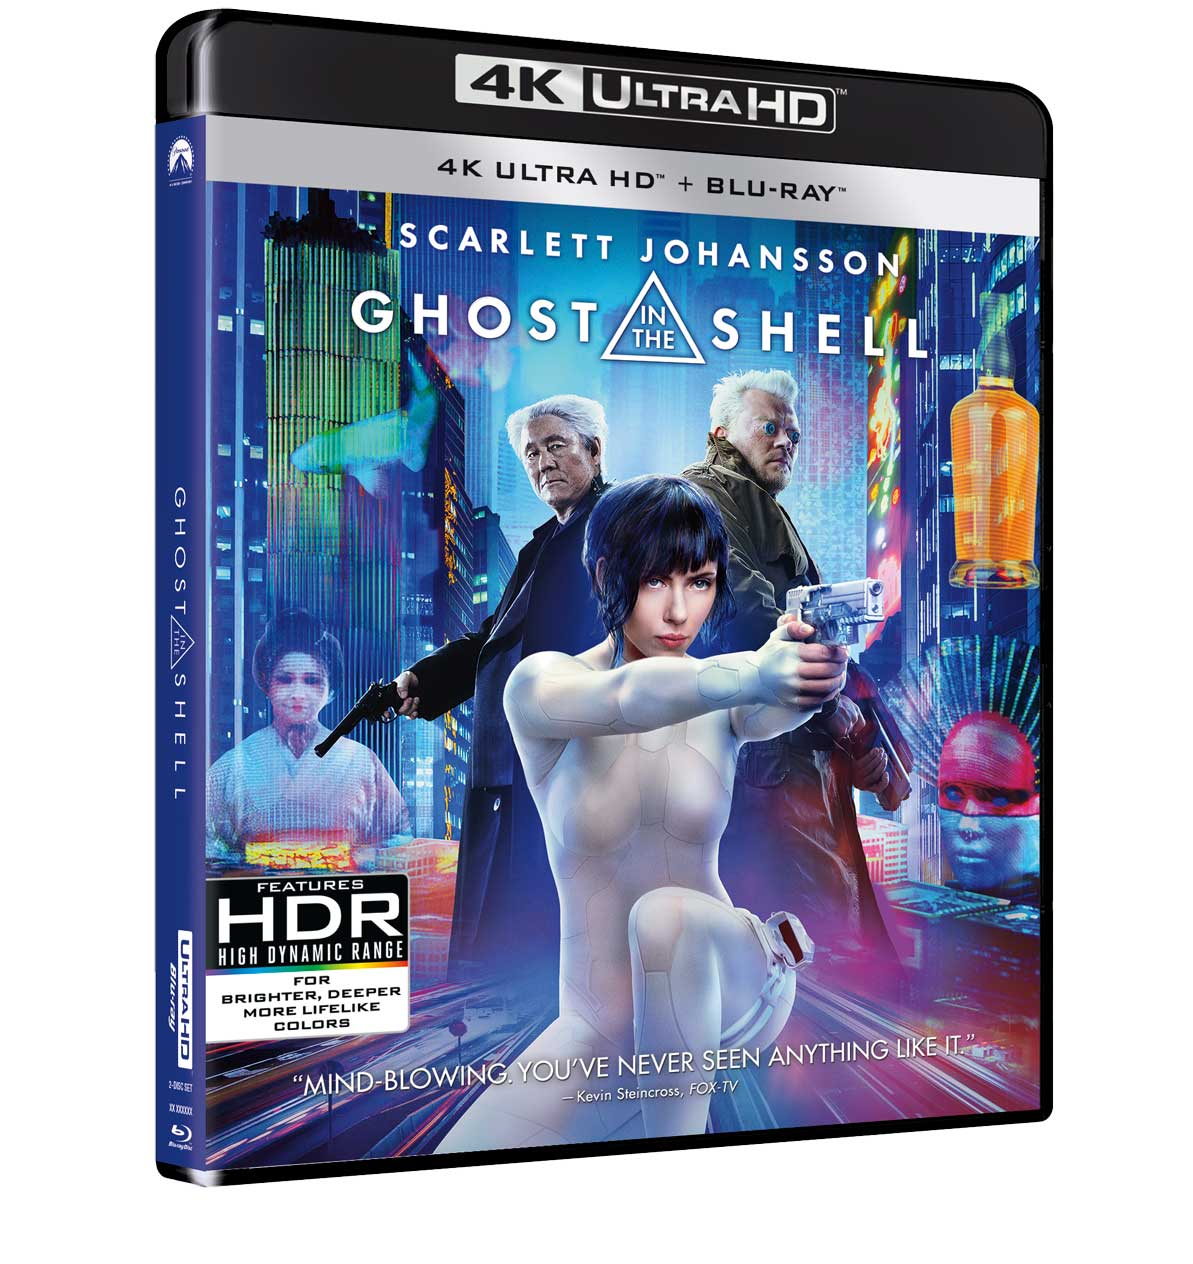 GHOST IN THE SHELL (BLU-RAY 4K ULTRA HD+BLU-RAY)